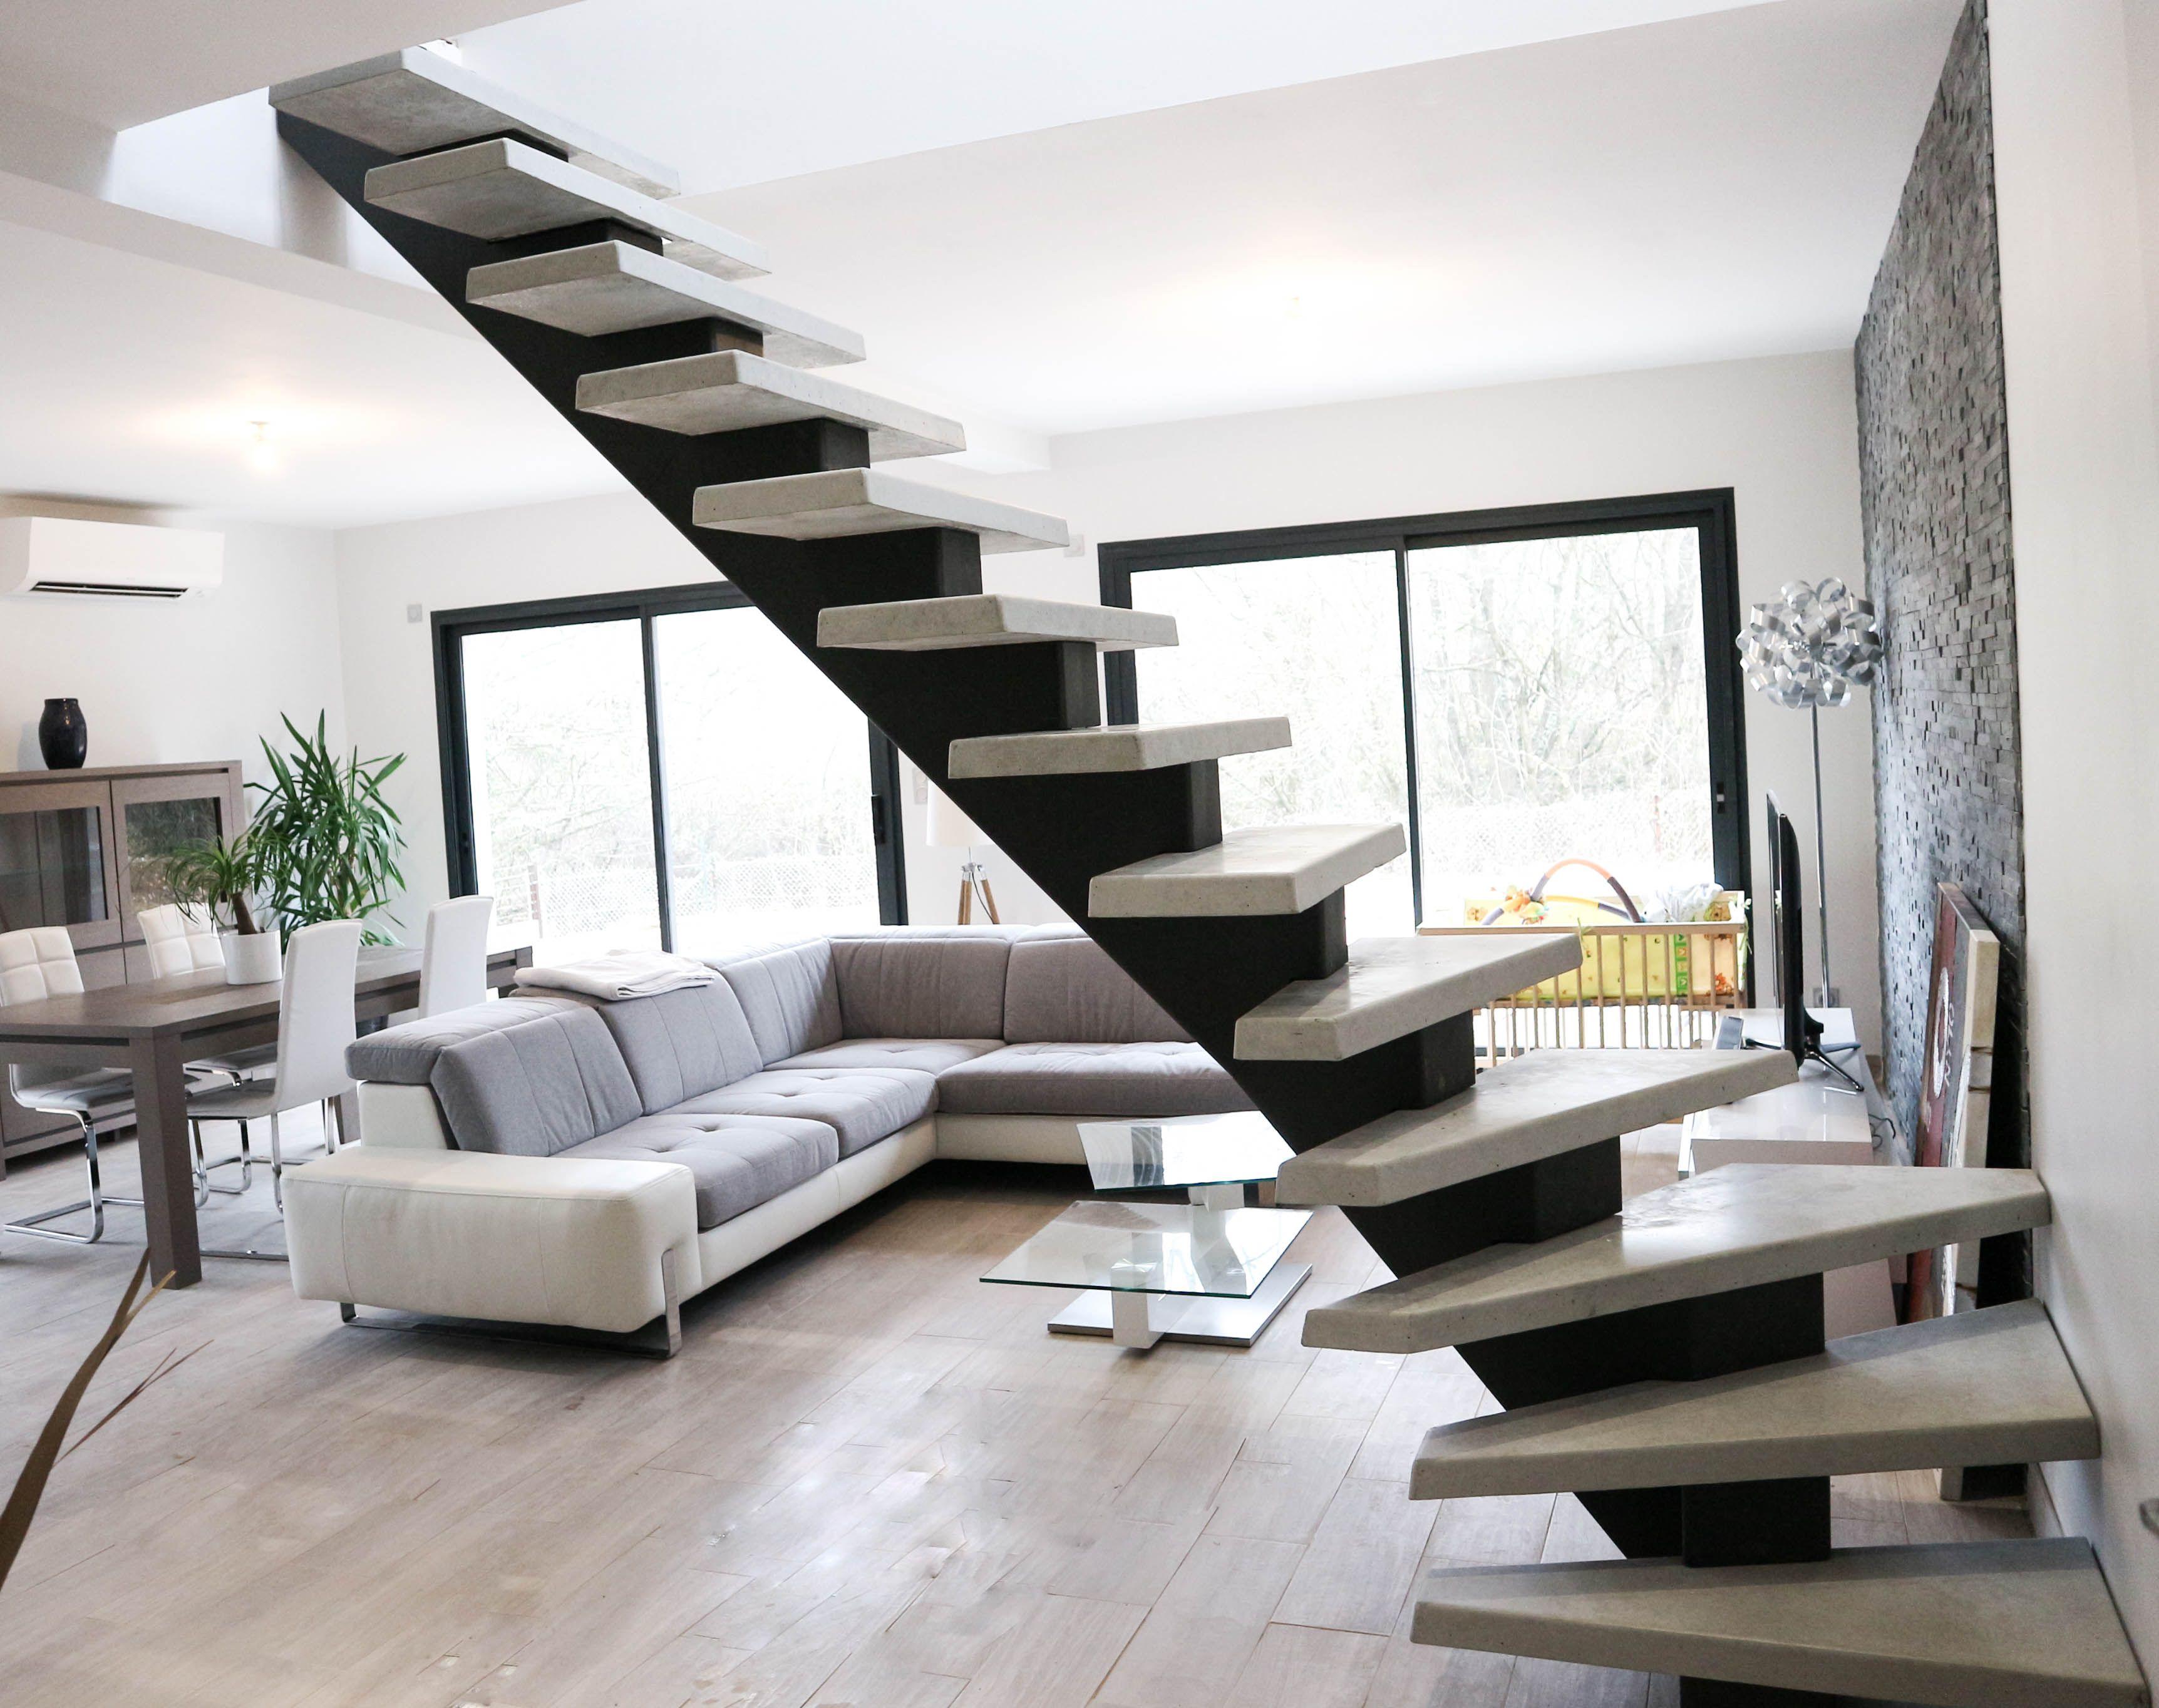 Escalier Interieur Beton Design manhattan escalier soloft crémaillère métal, marche béton